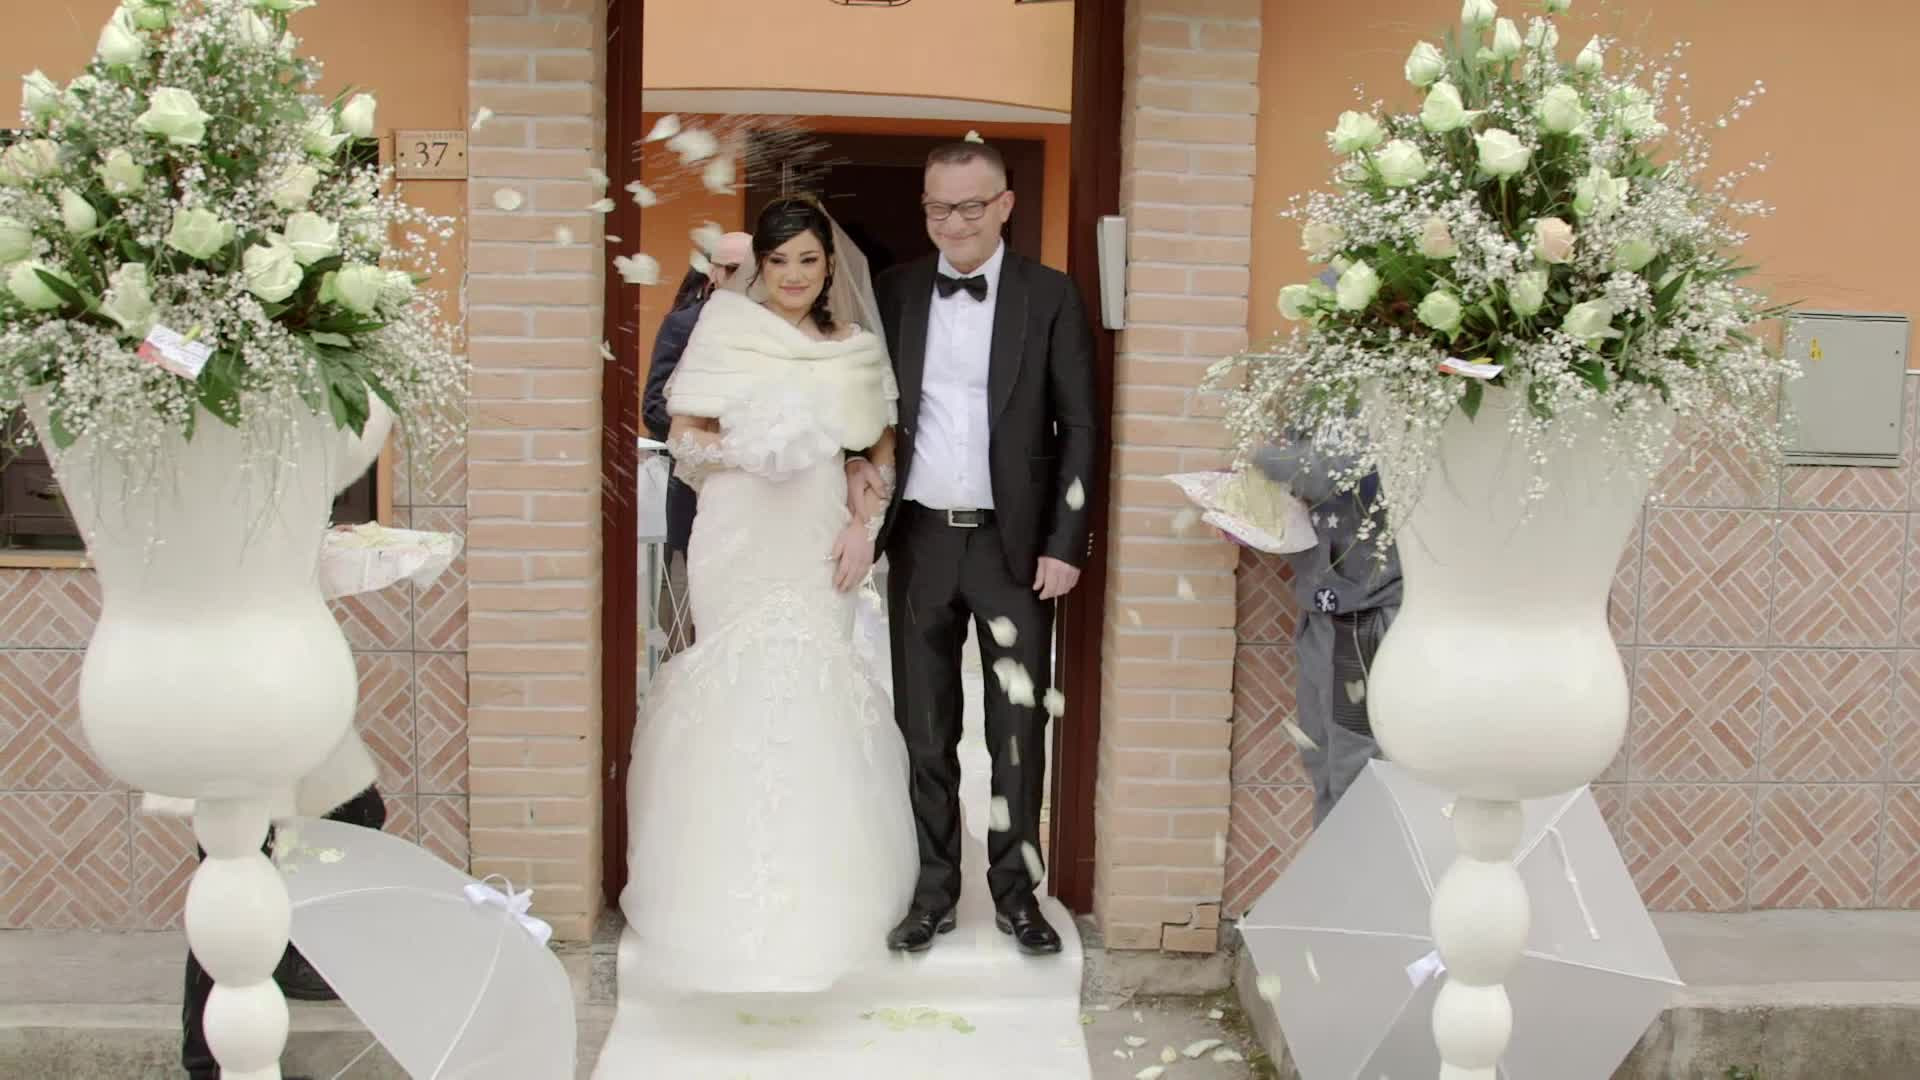 matrimonio non datare Eng Sub EP 1 scaricare